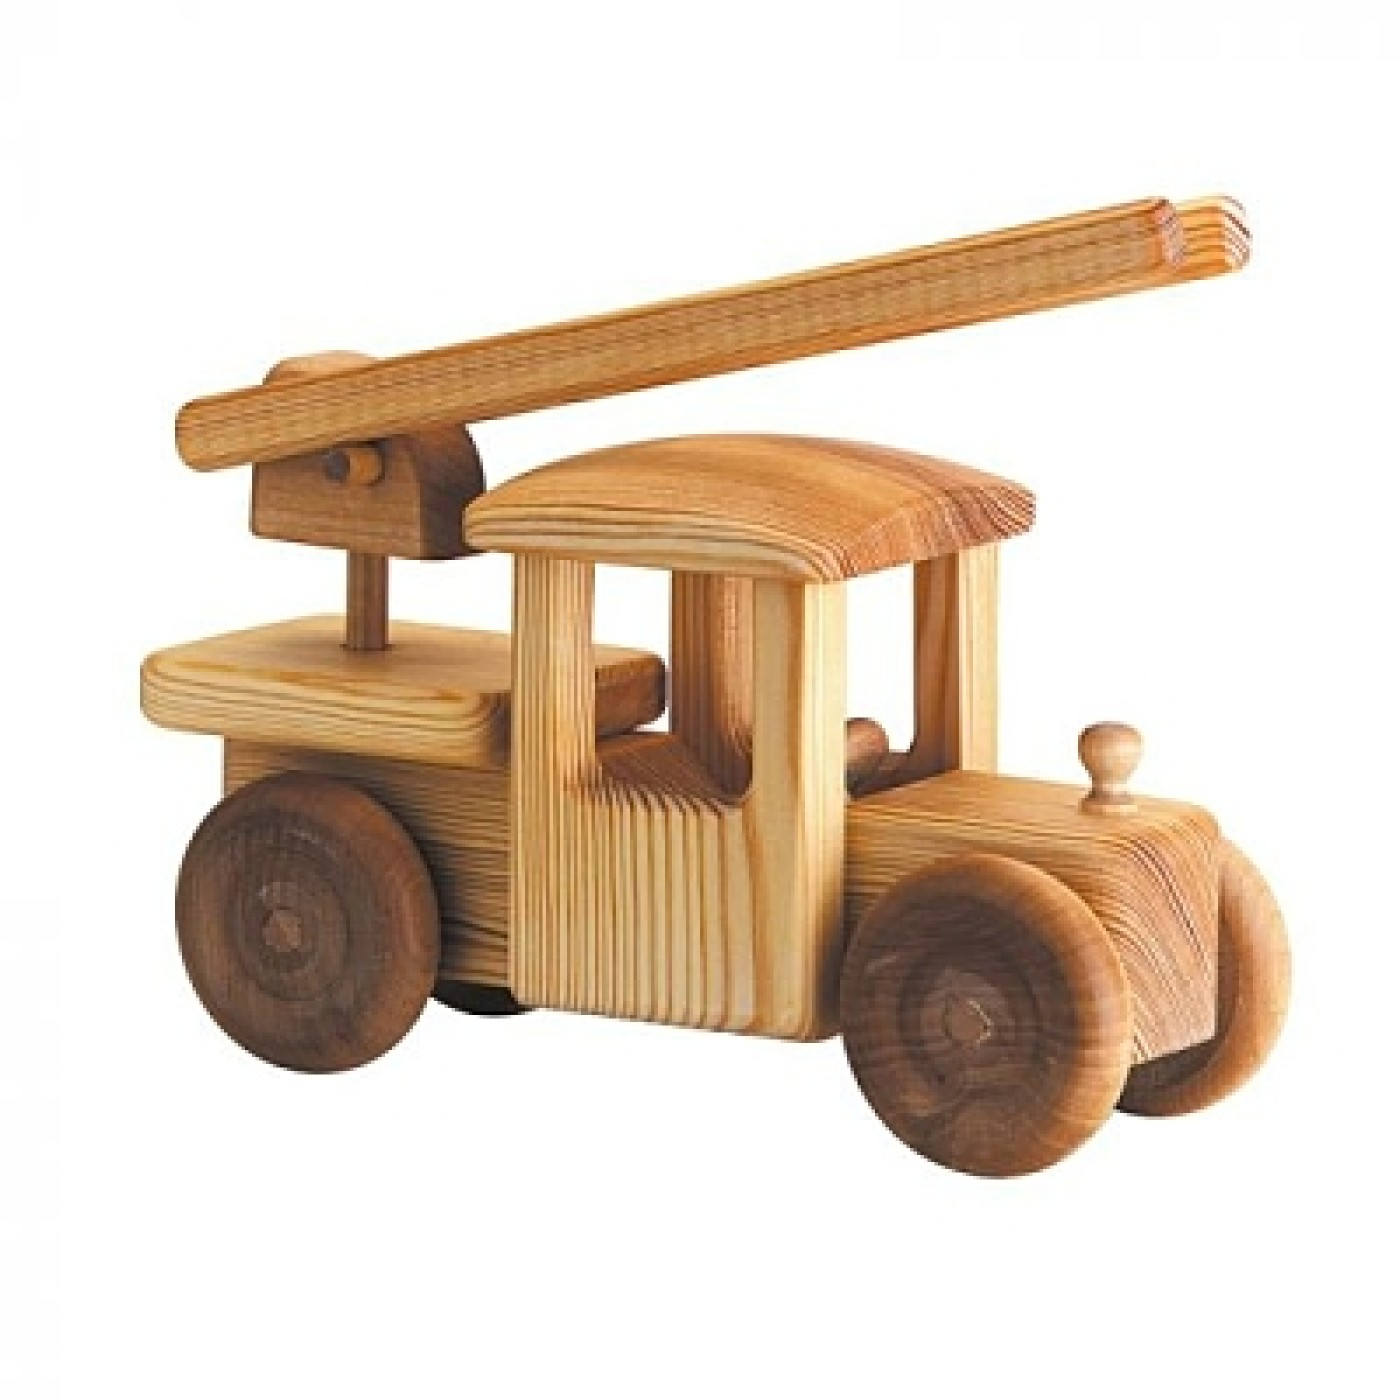 Debresk Wooden Toy Fire Truck Large